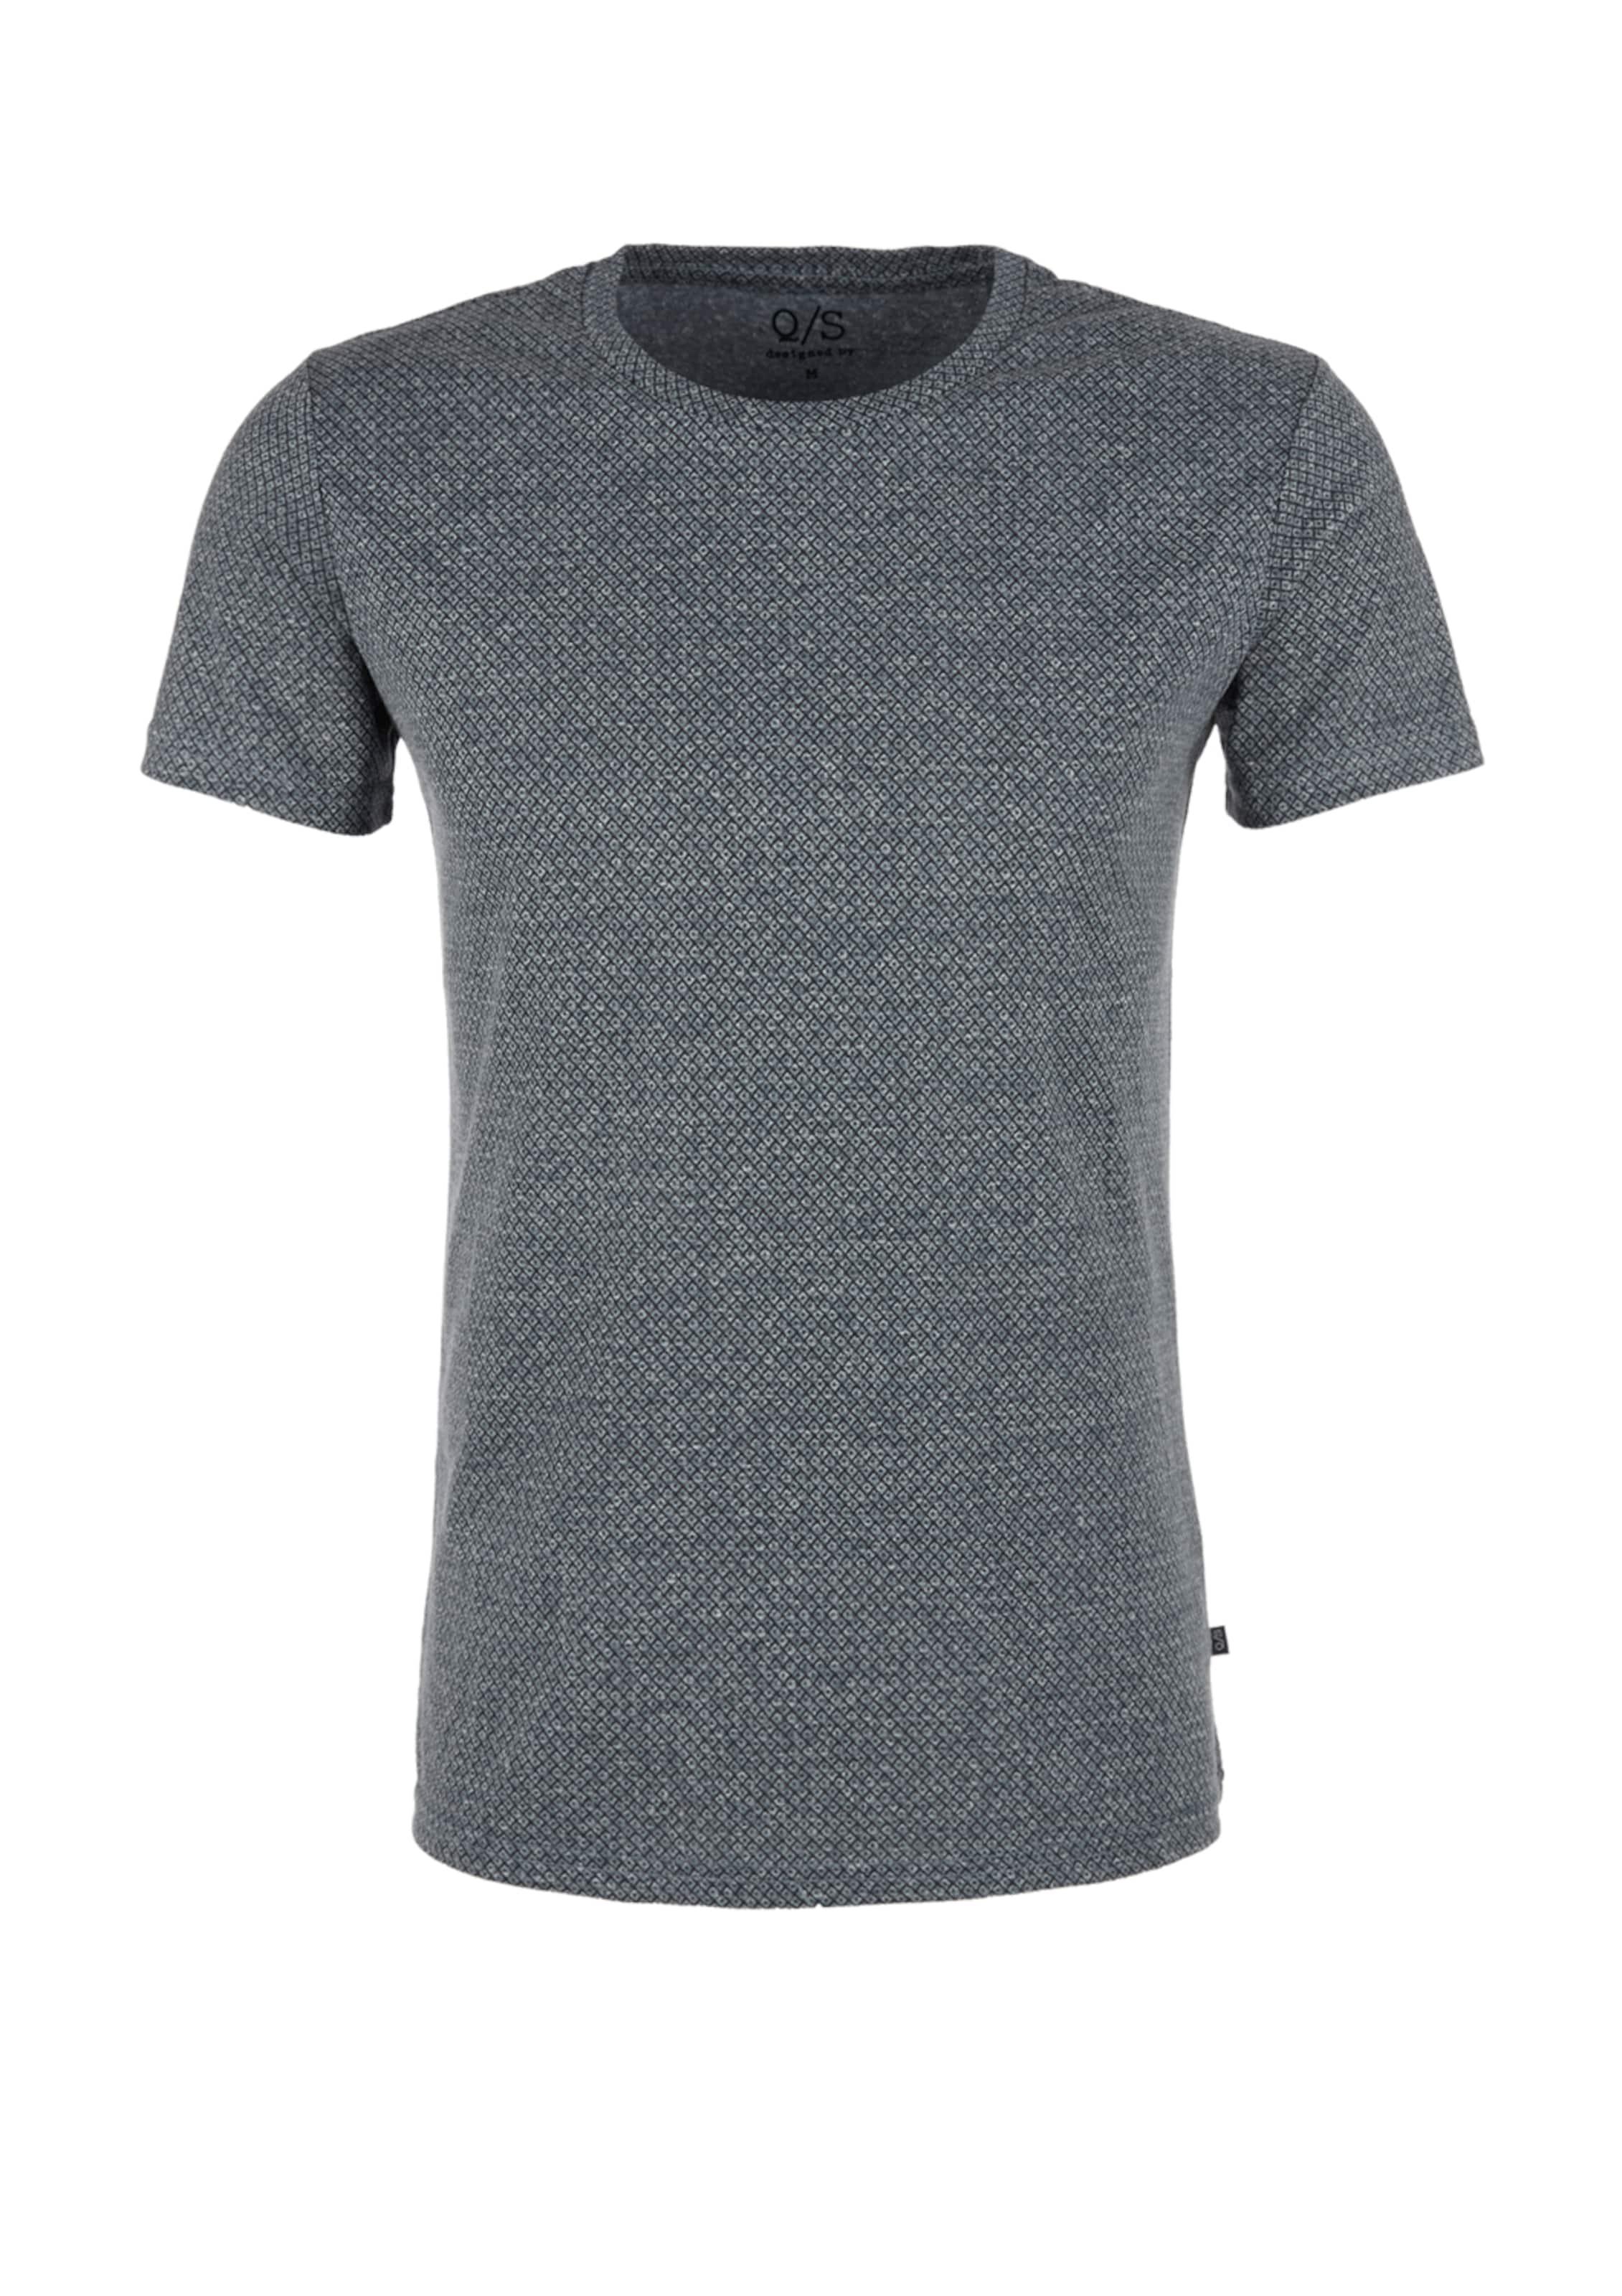 Rauchgrau By T Q In s Designed shirt Ygyvf6b7